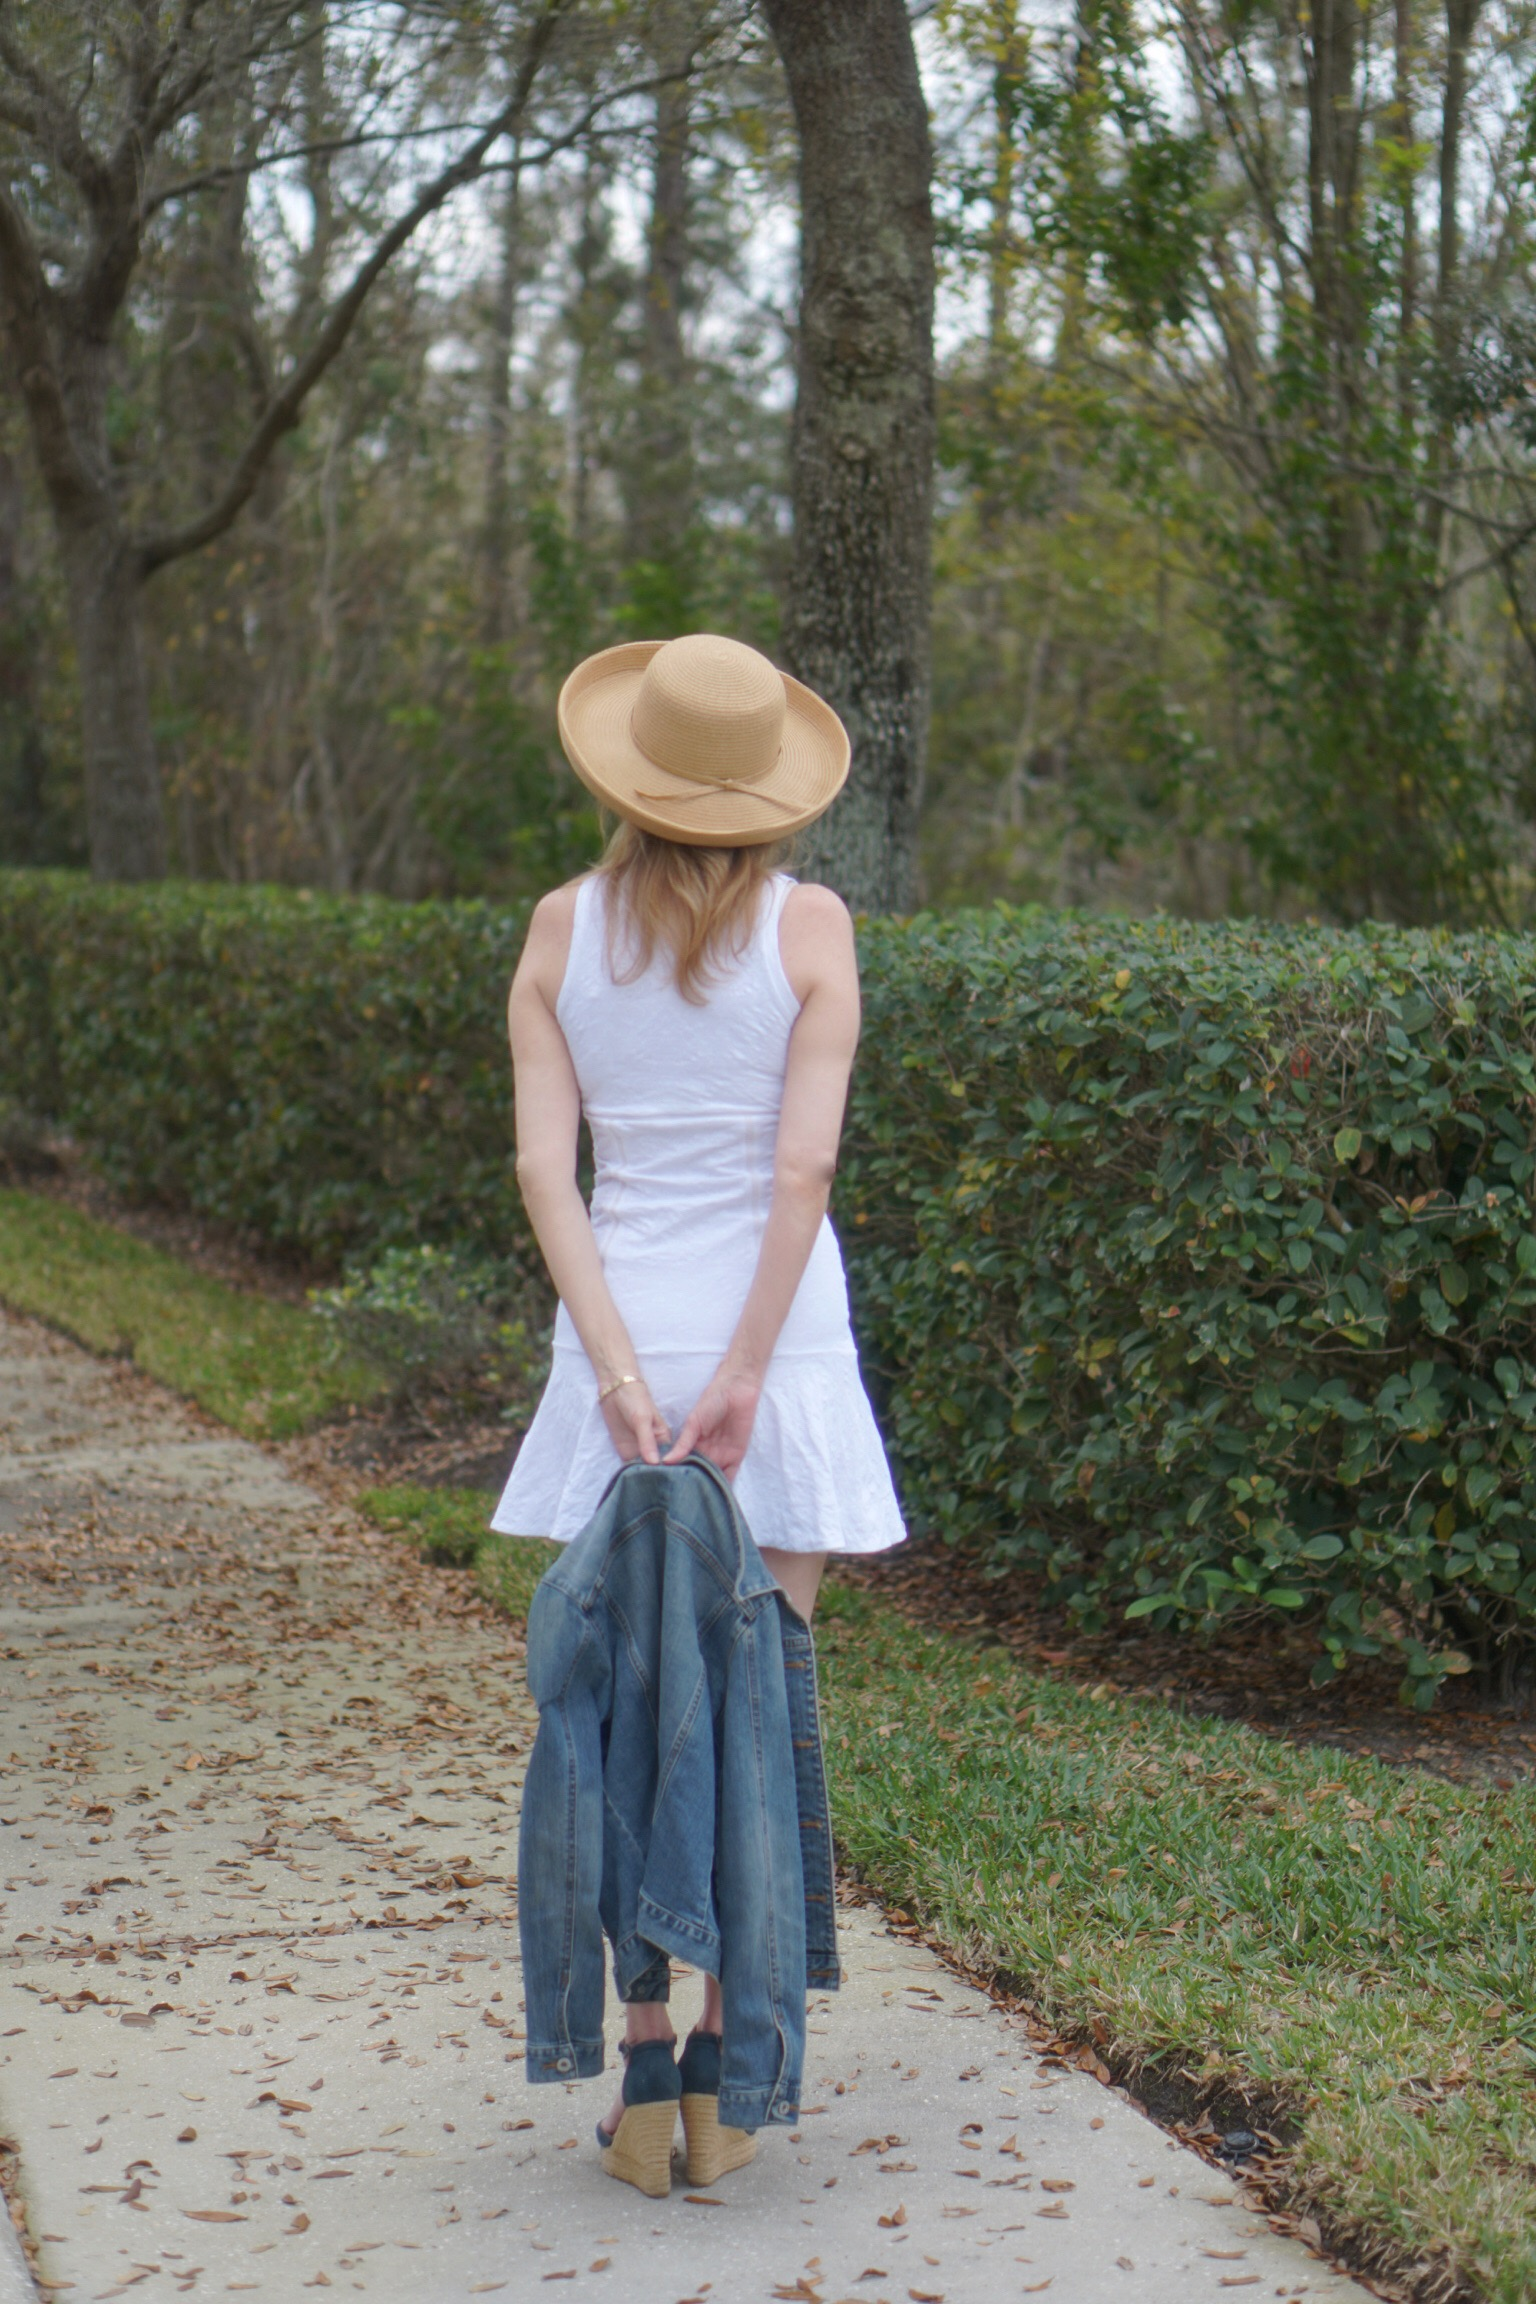 At a Crossroads, White E'Etoile Tennis Dress